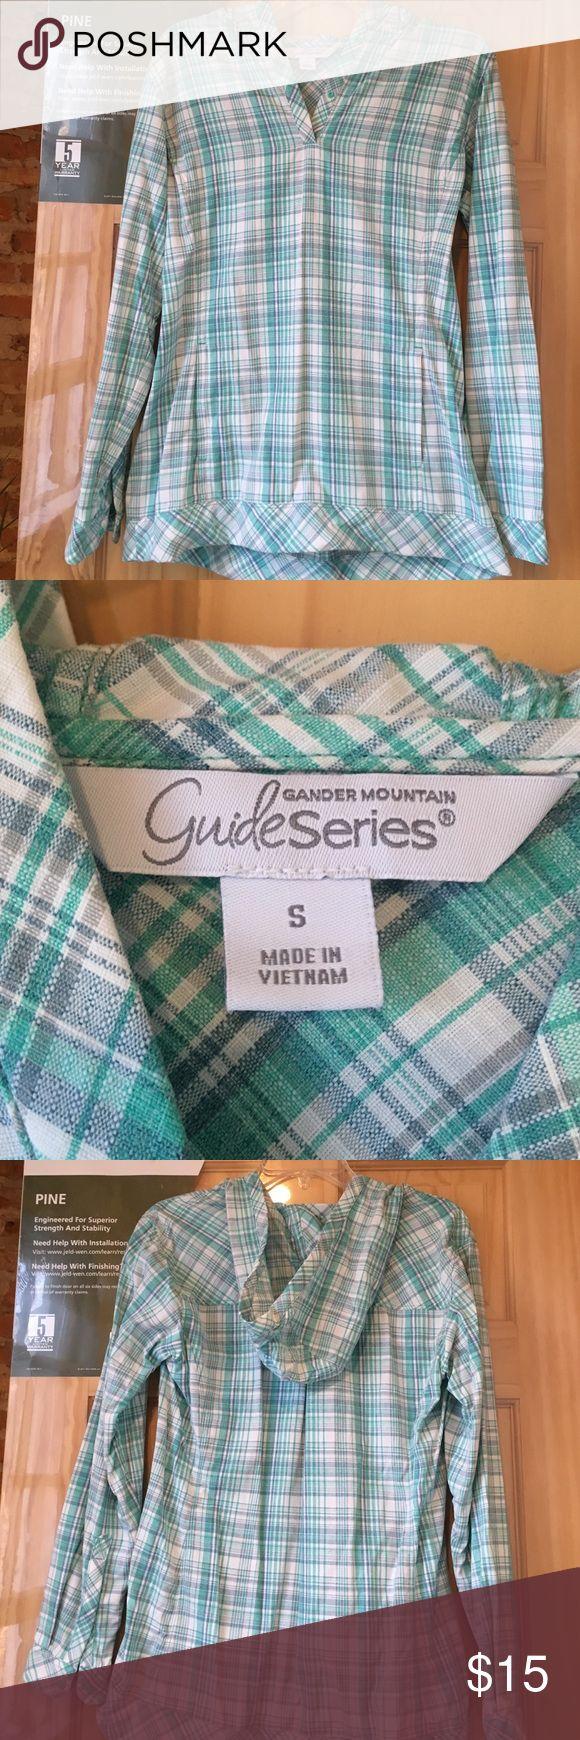 Gander Mountain Guide Series shirt Gander Mountain guide series pull over shirt size sm Gander Mountain Tops Tunics